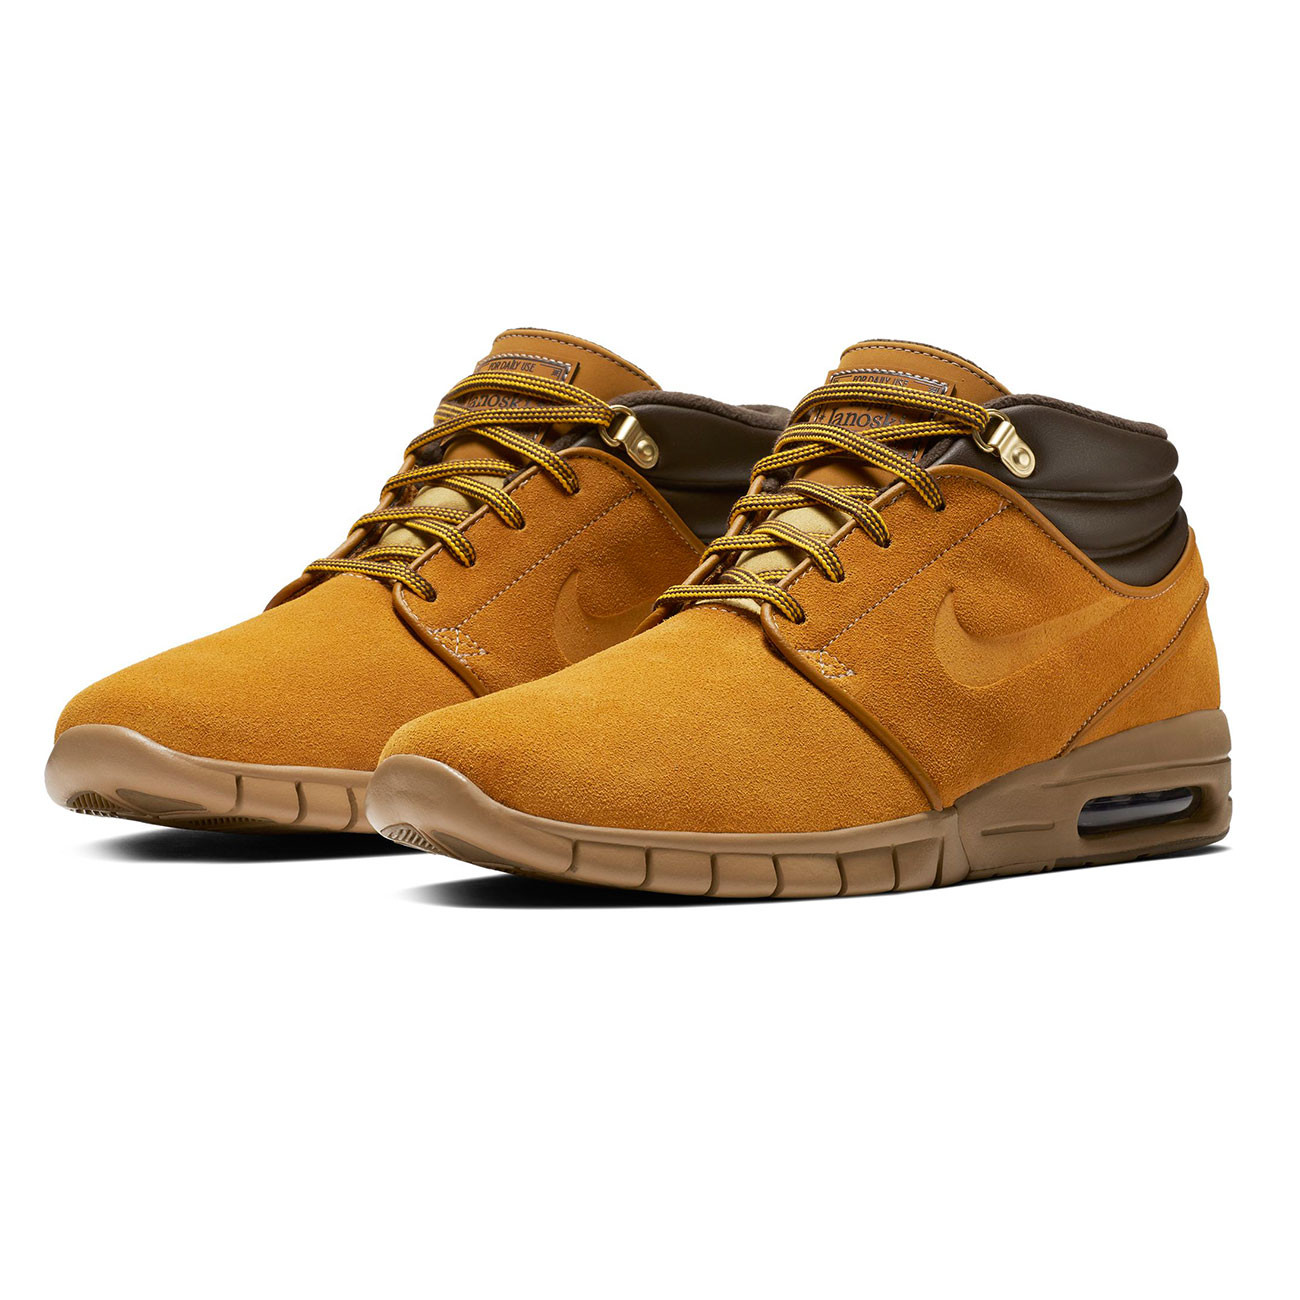 9cfed3a807 Sneakers Nike SB Stefan Janoski Max Mid Premium bronze/bronze-gum ...